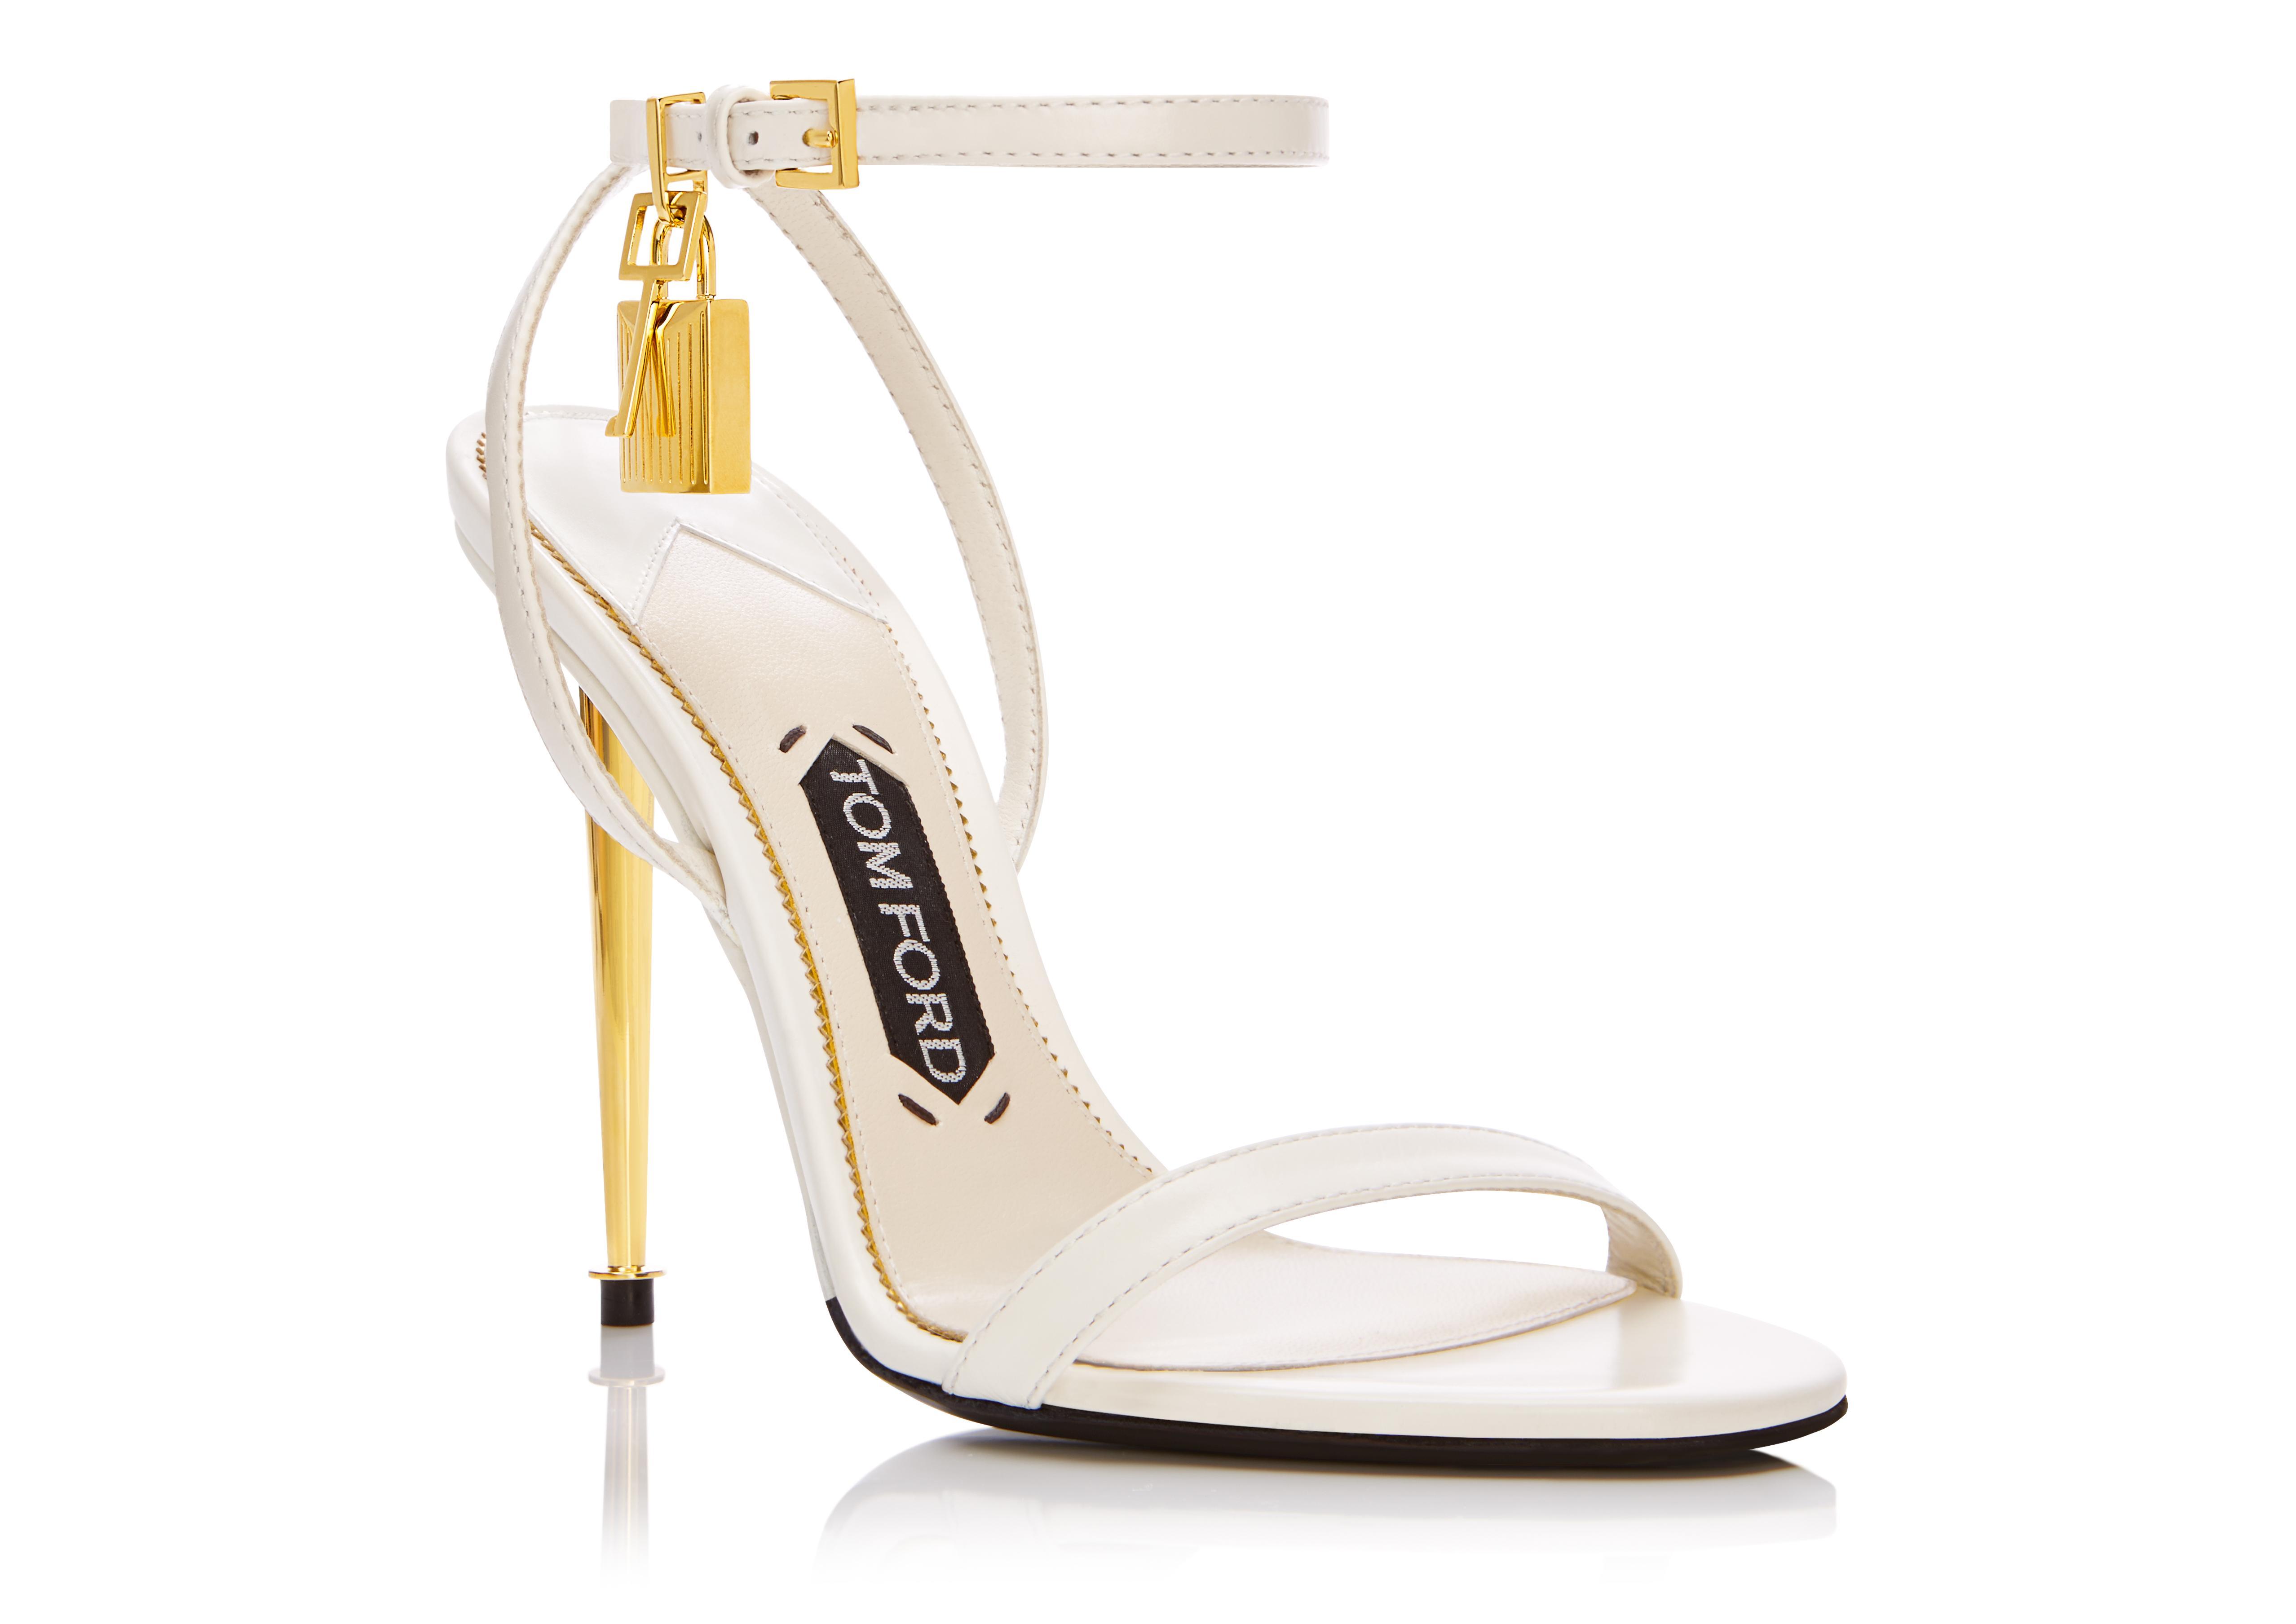 popsugar heels ford fashion sephora at tom